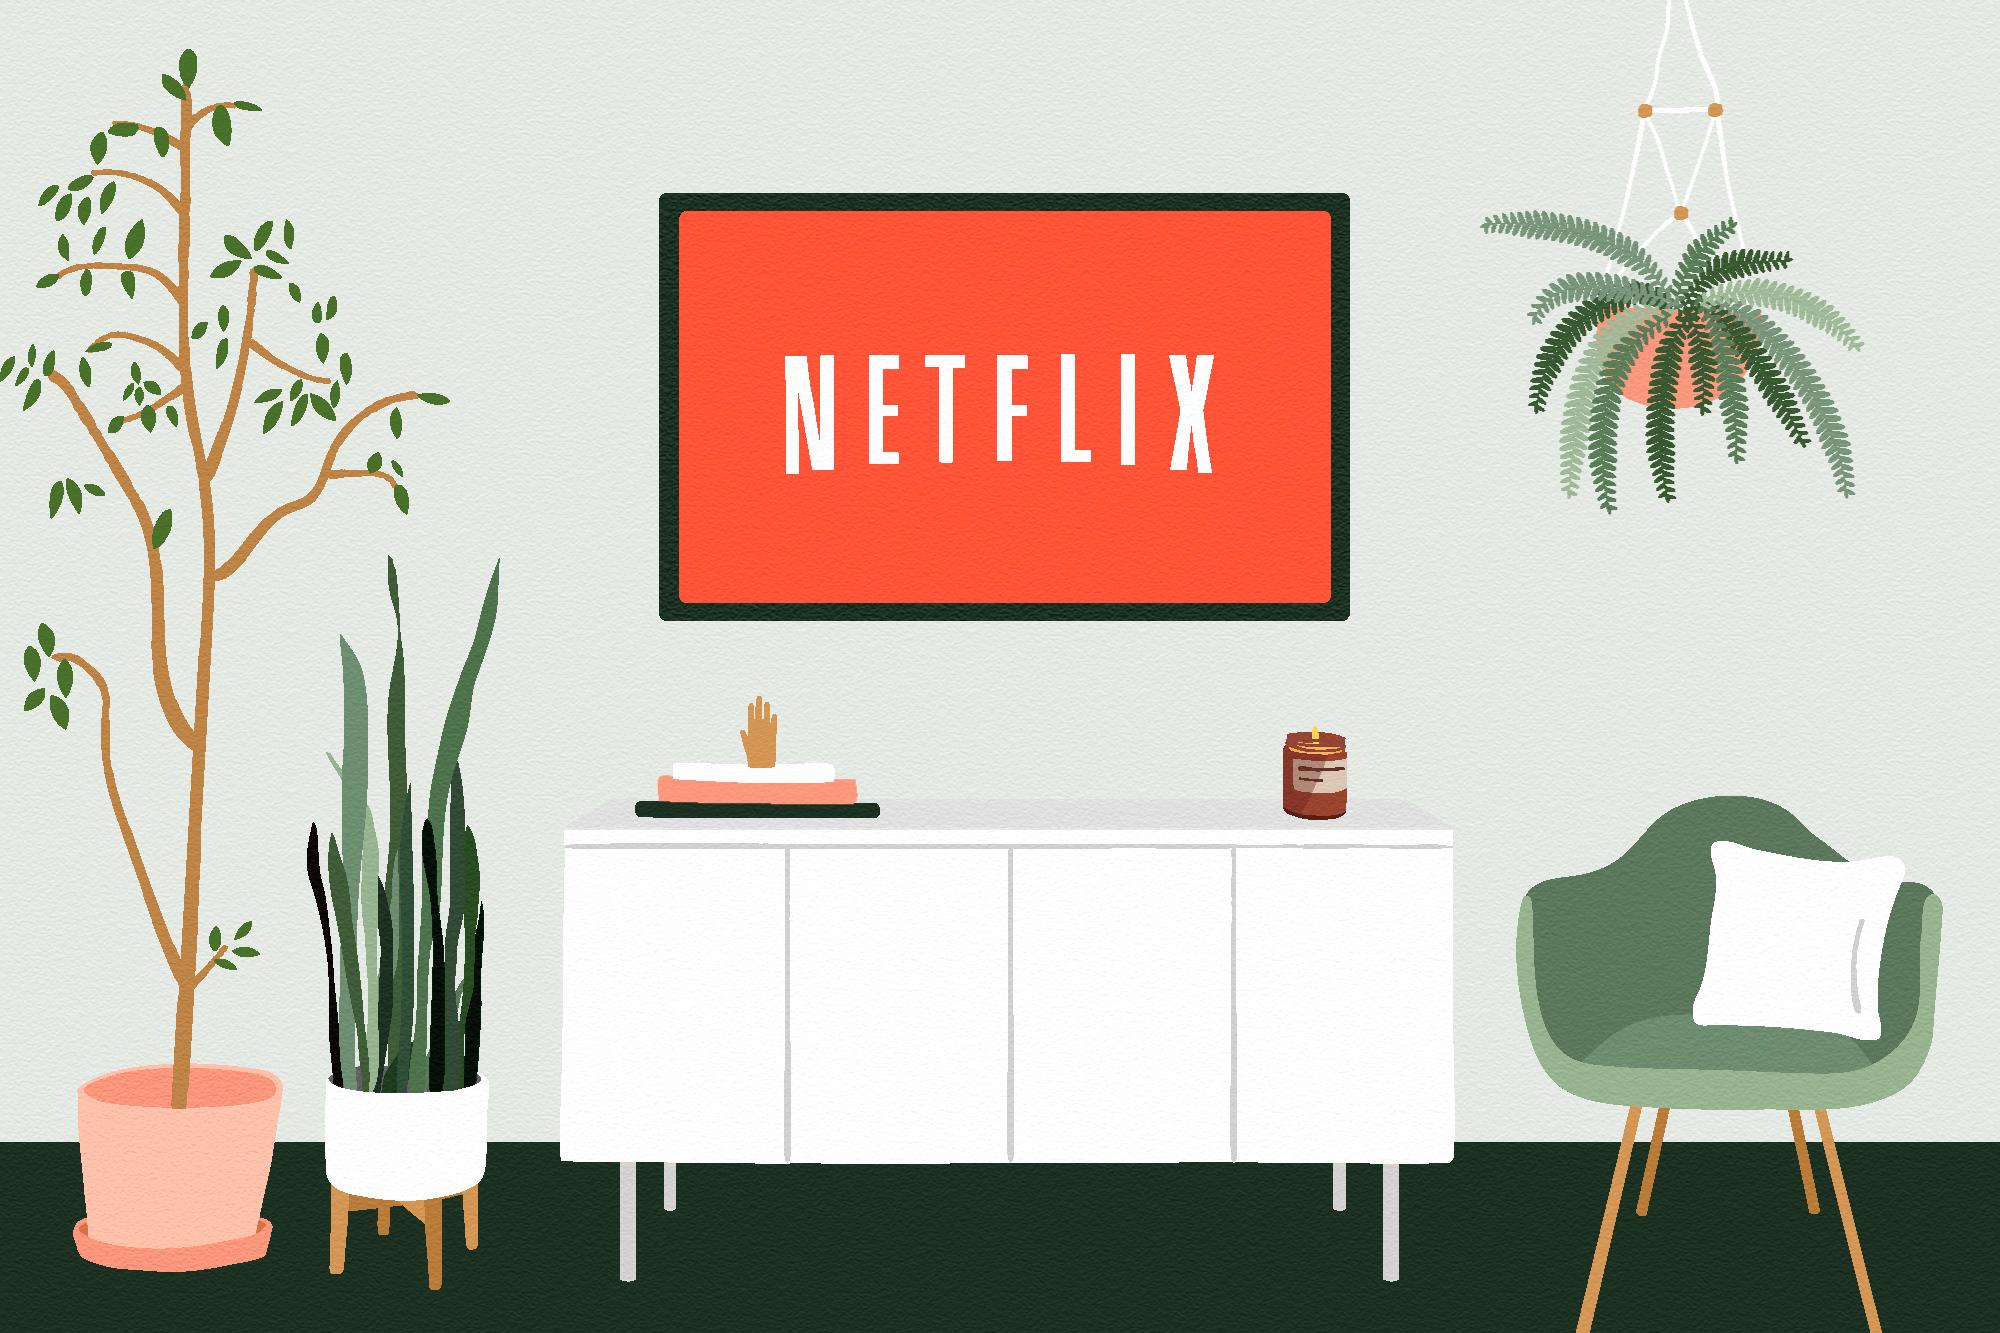 Netflix Job Get Paid to Watch TV - Content Analyst